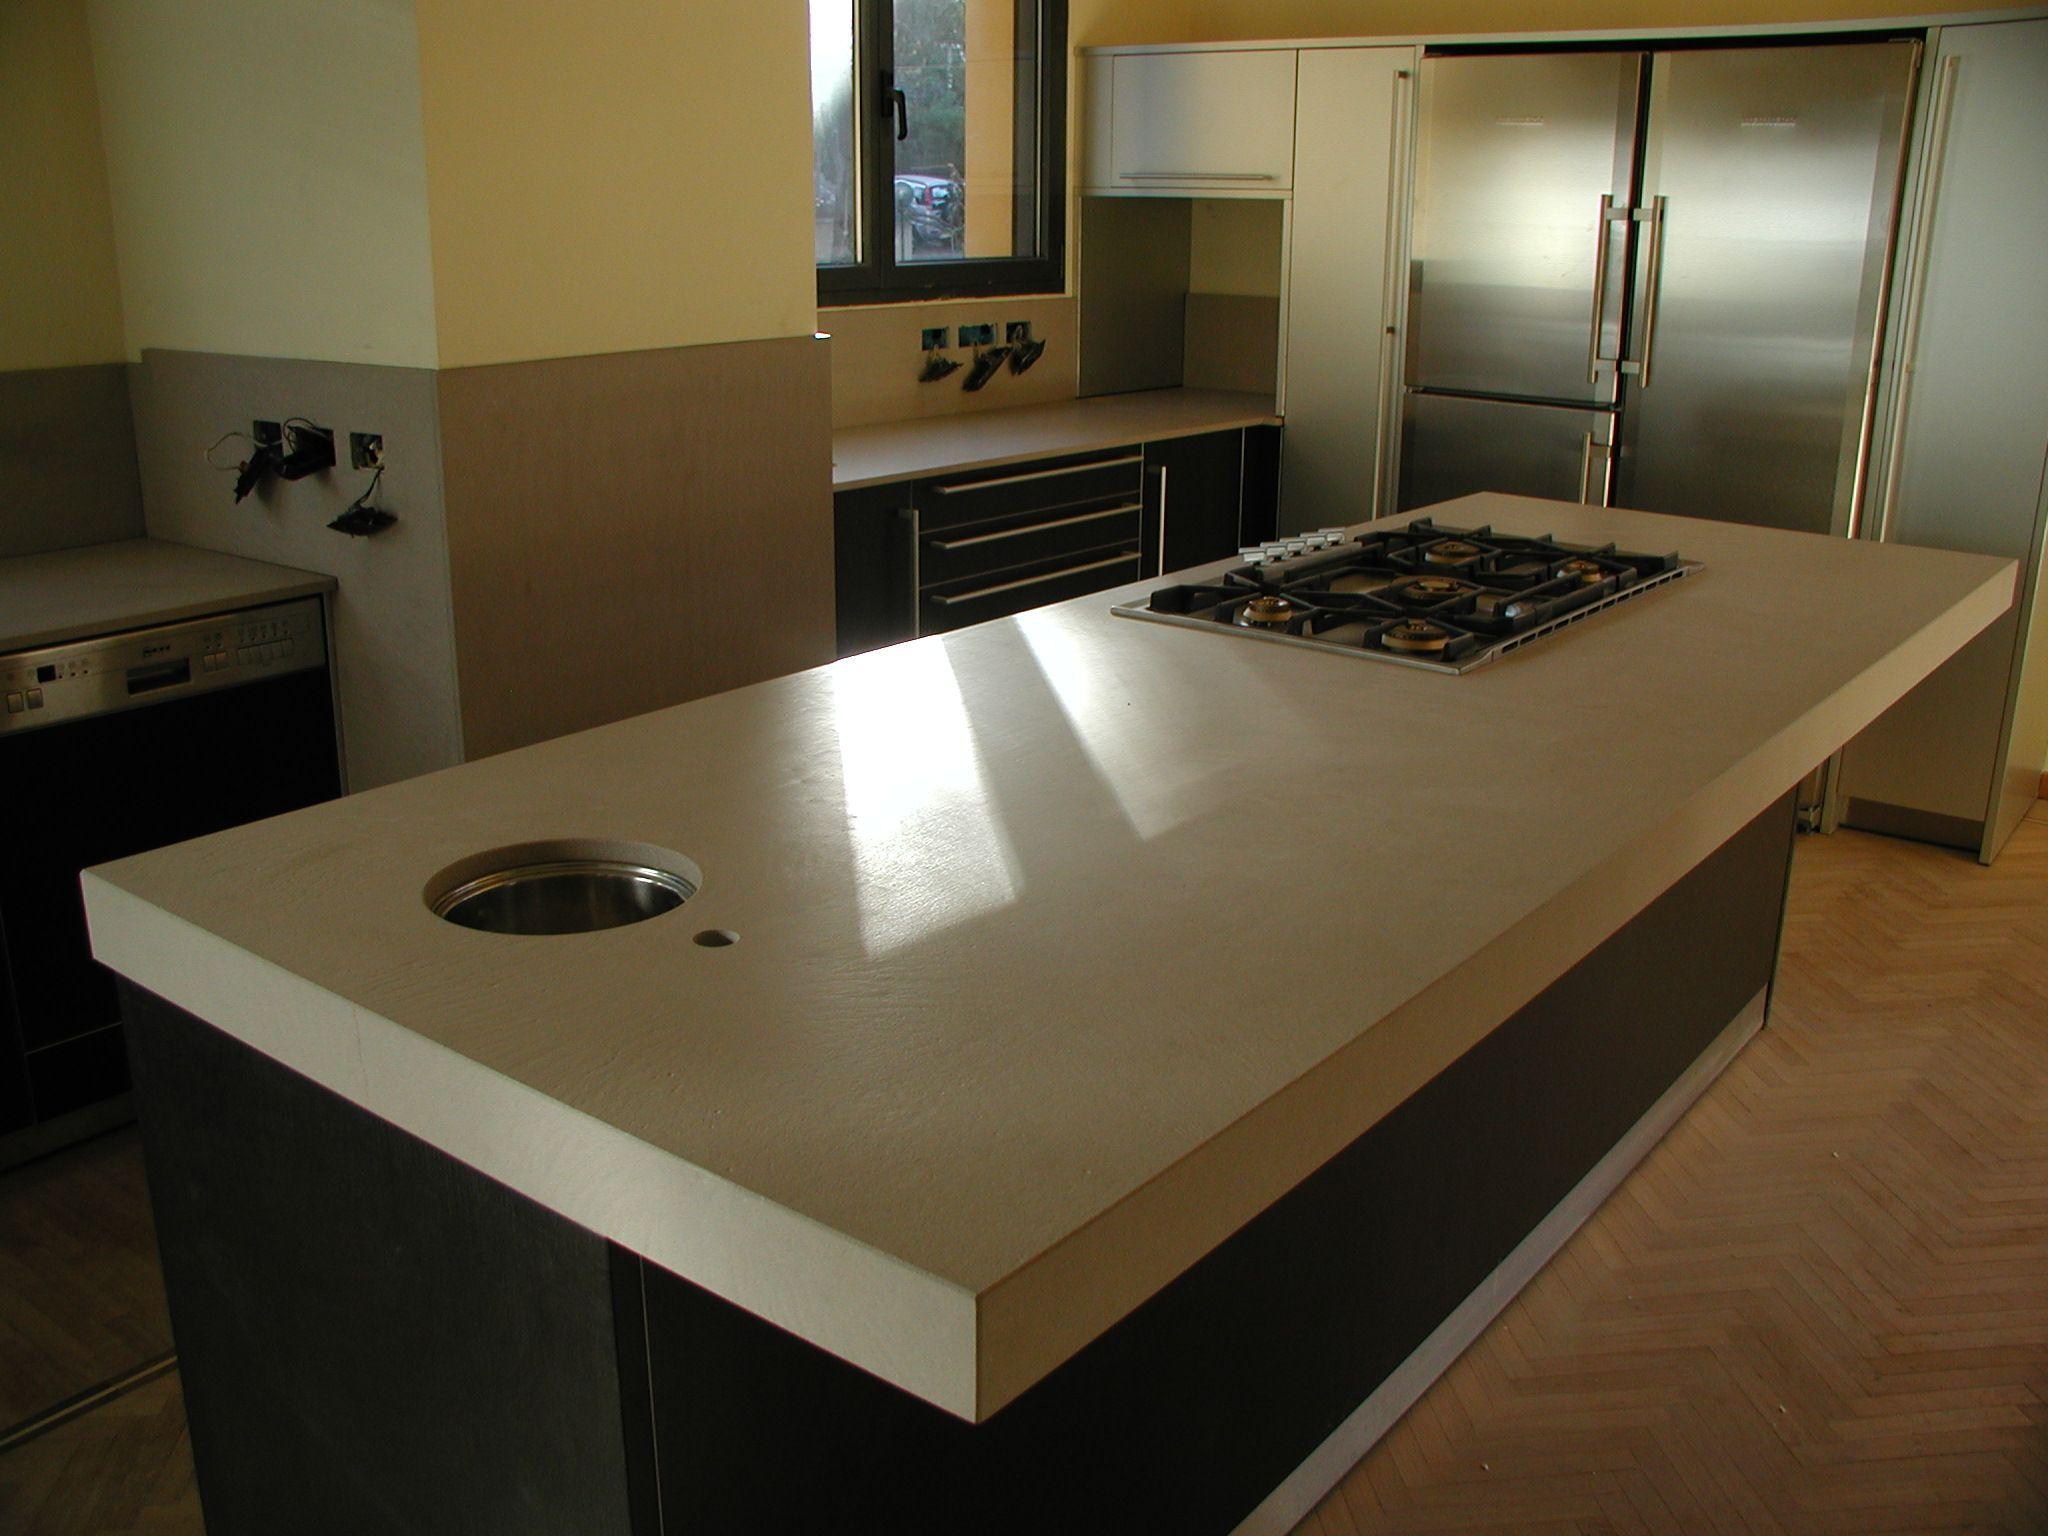 Top cucina Bulthaup in quarzo vanilla Stoneitalia ...